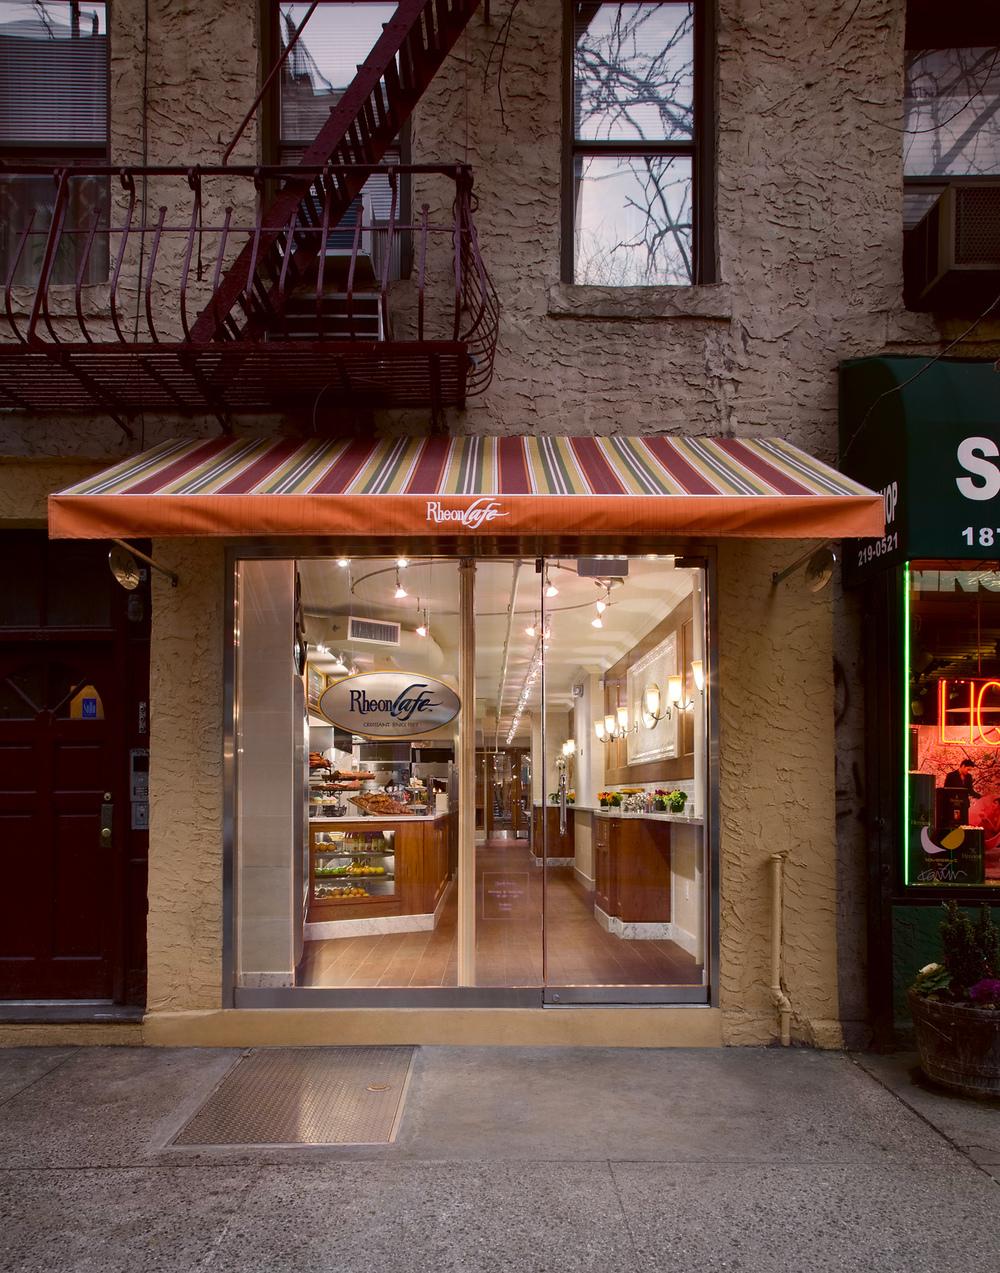 Tobin Parnes Design. Rheon Cafe. NYC. Hospitality Design. Restaurant. Cafe. Bakery. Storefront. Facade.